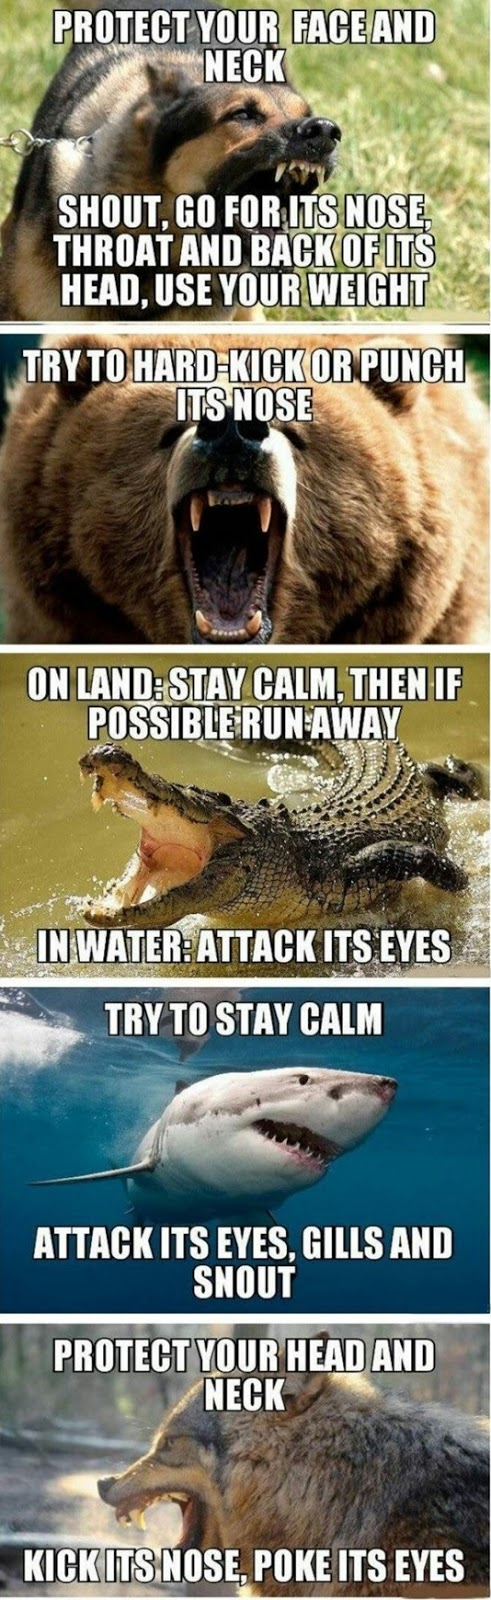 Fighting Off Wild Animals